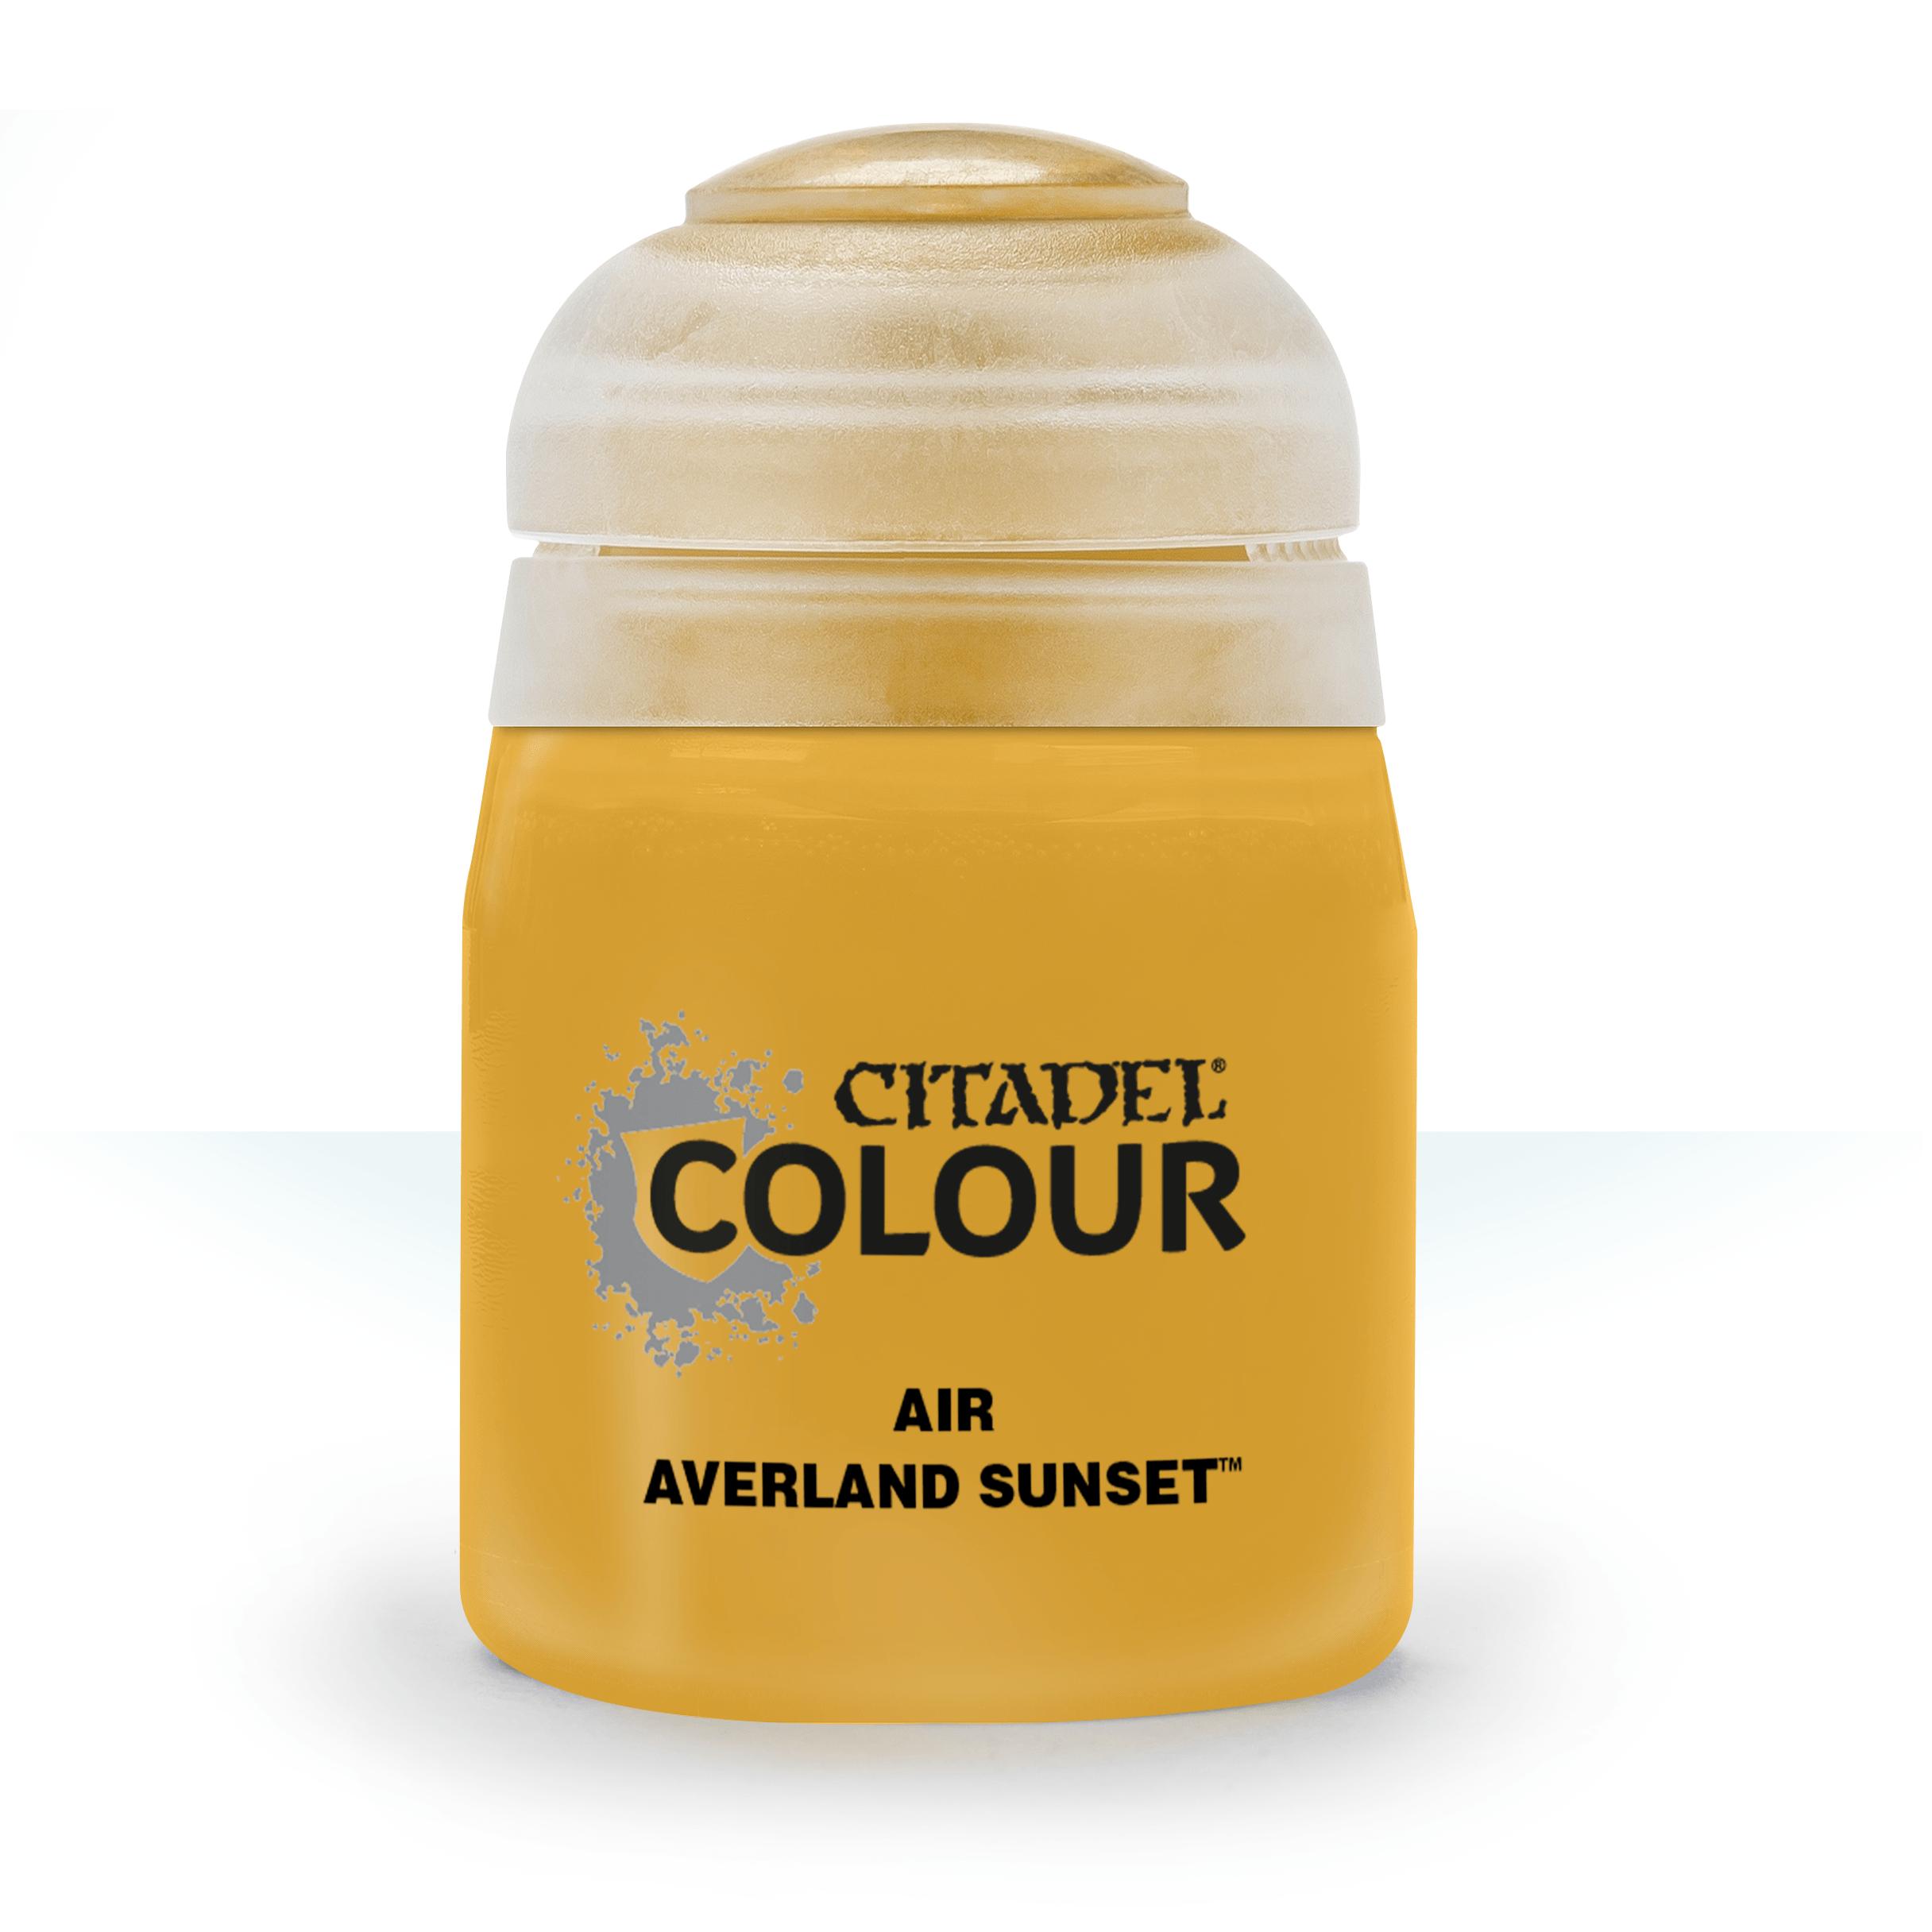 Averland Sunset, Citadel Air 24ml